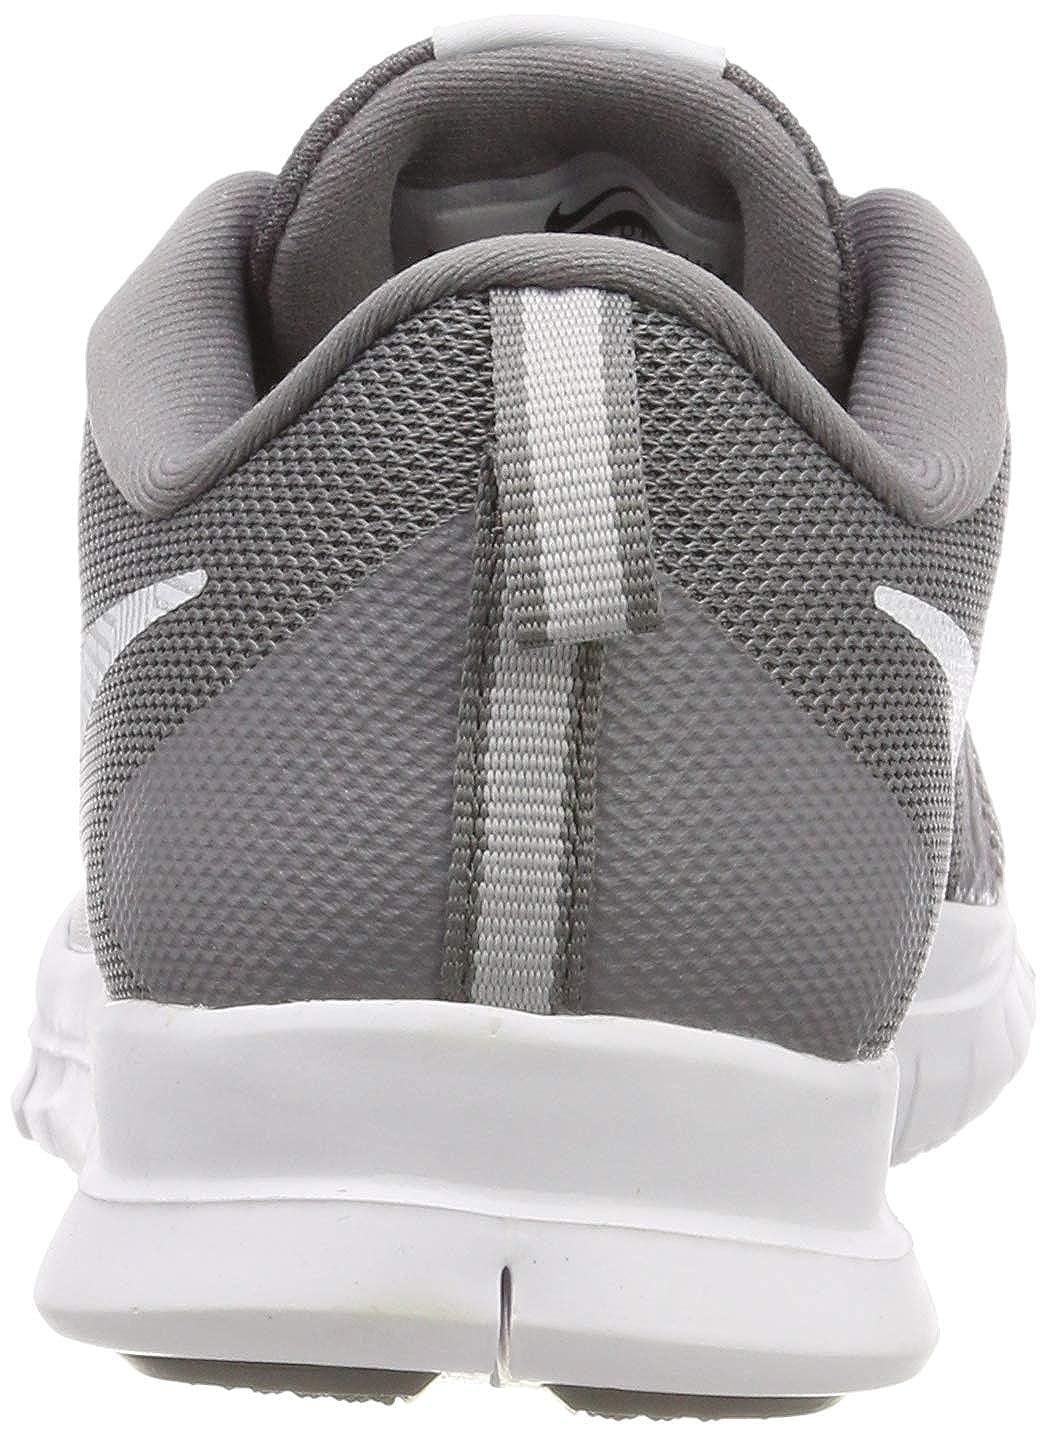 newest collection 9ffd5 671d4 Nike Wmns Flex Essential TR Scarpe da Fitness Donna - www ...